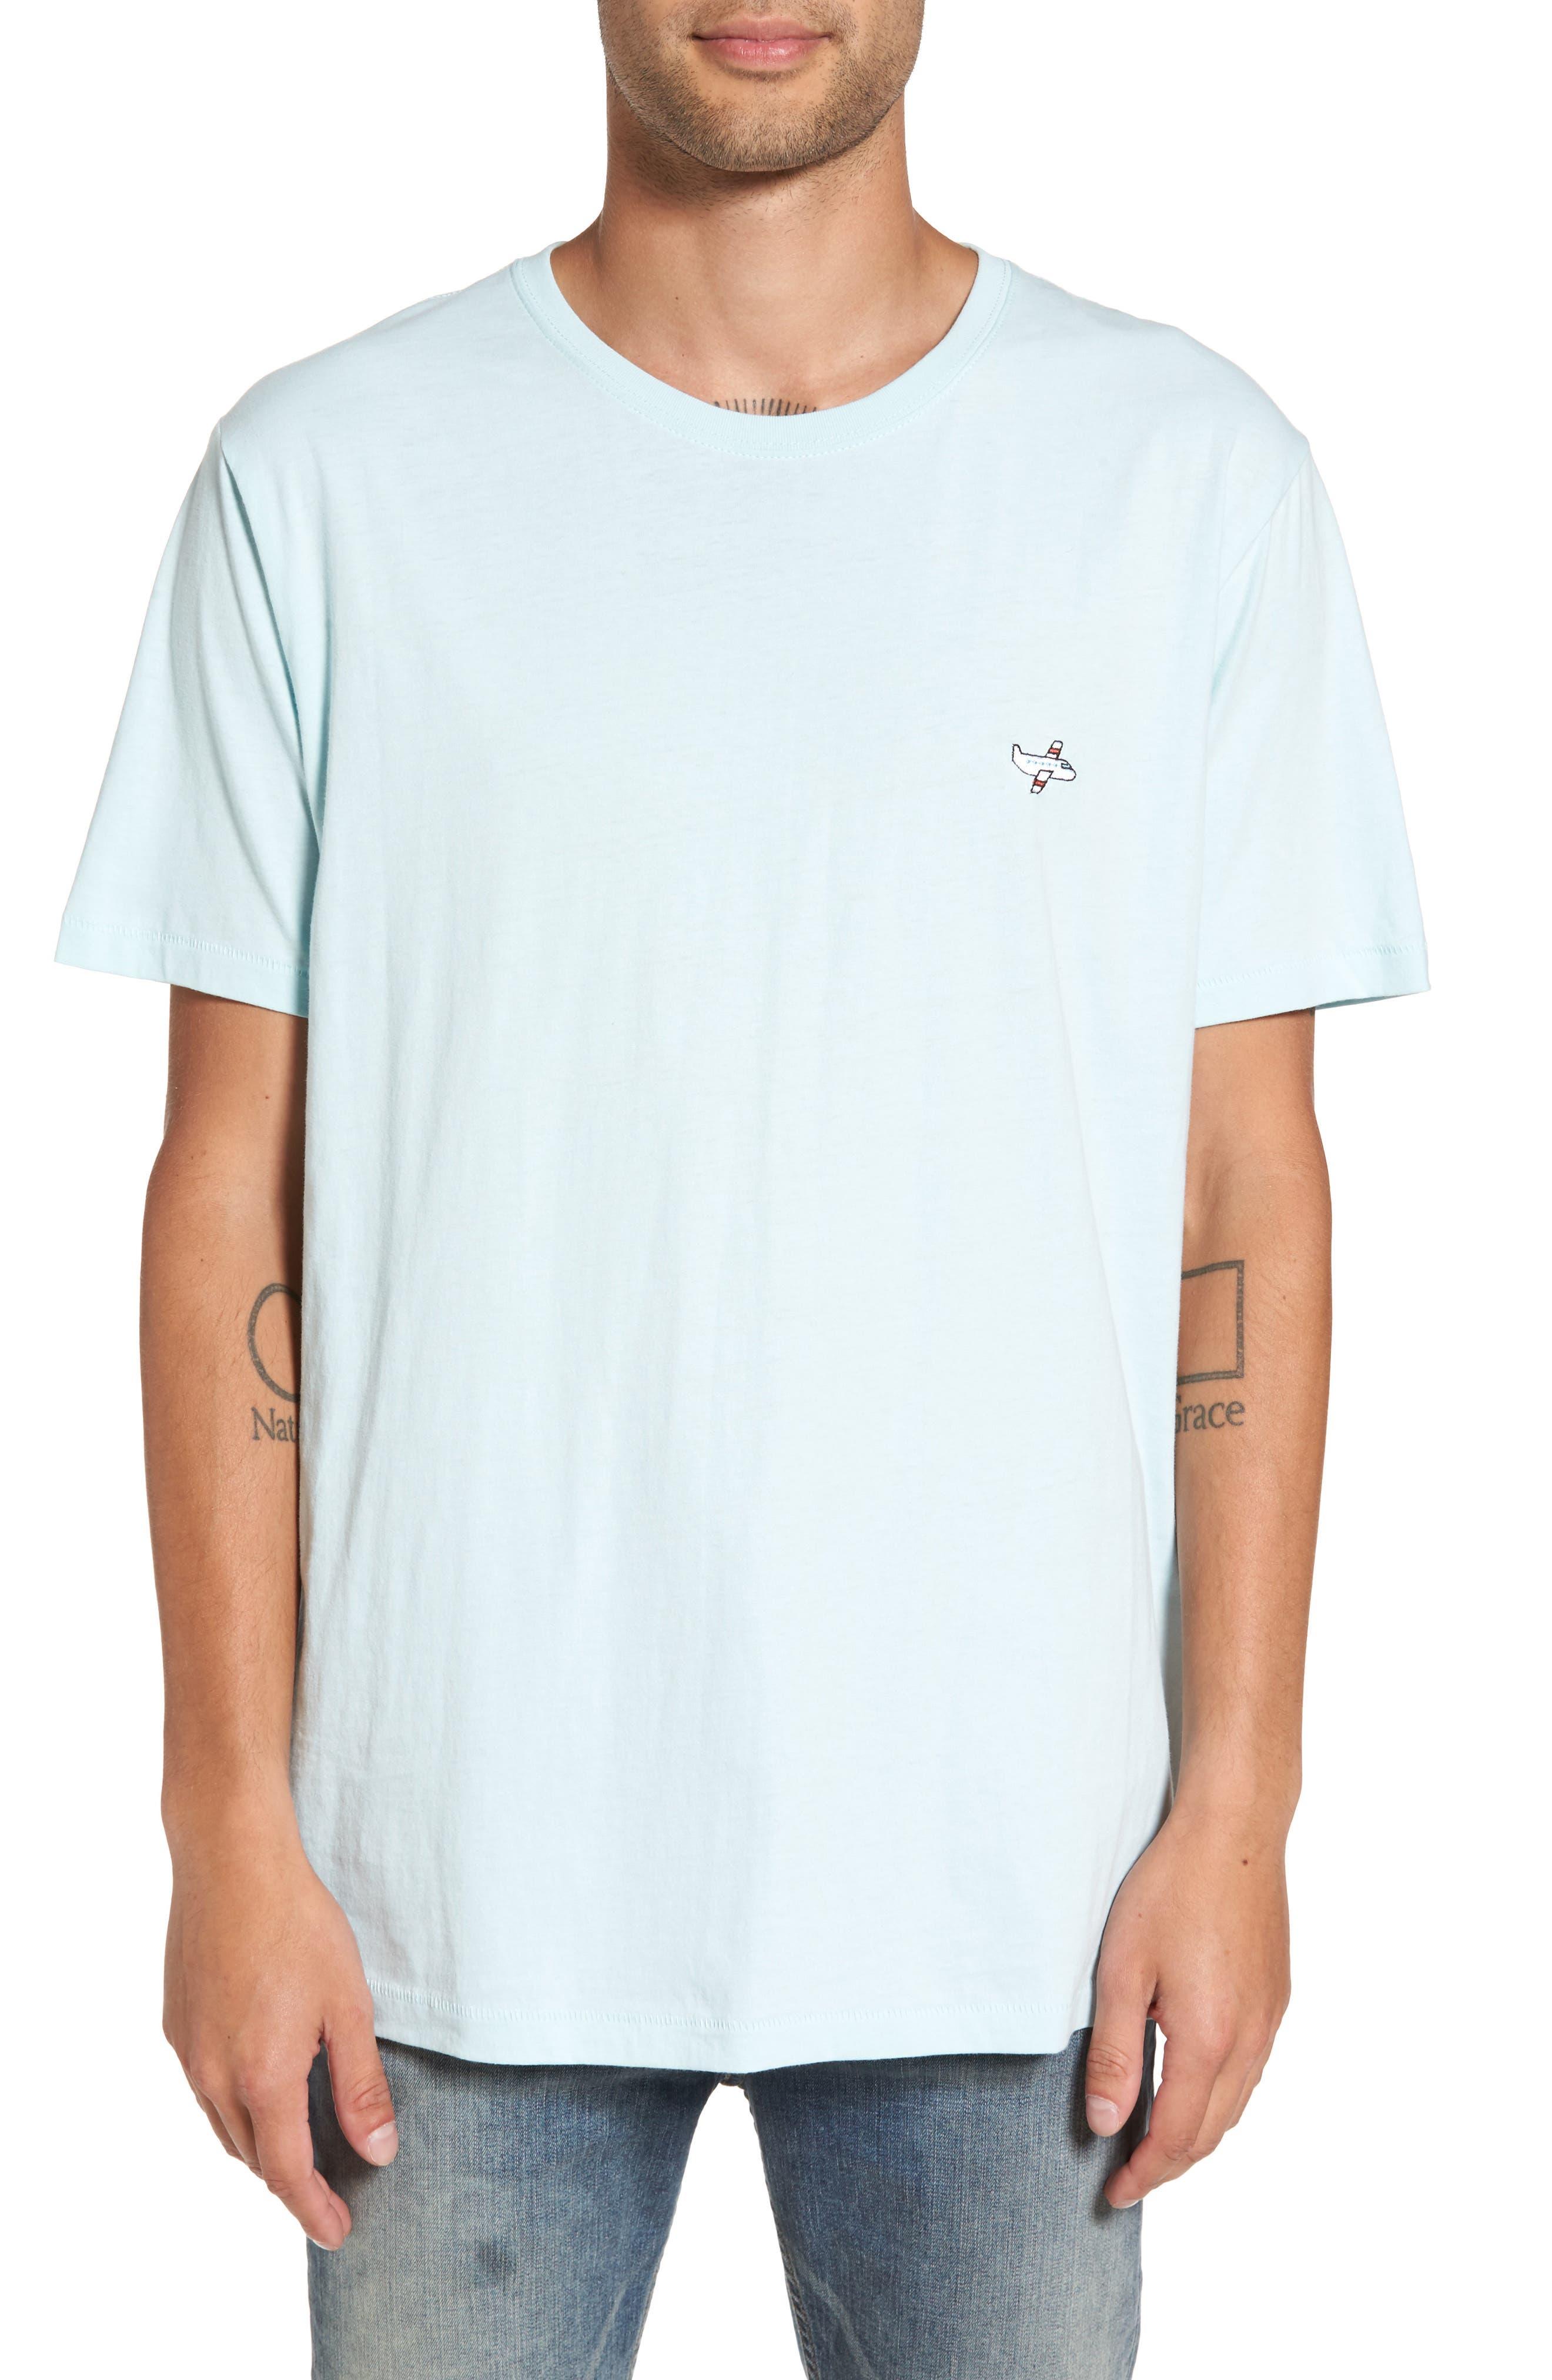 Aeroplane Appliqué T-Shirt,                             Main thumbnail 1, color,                             440